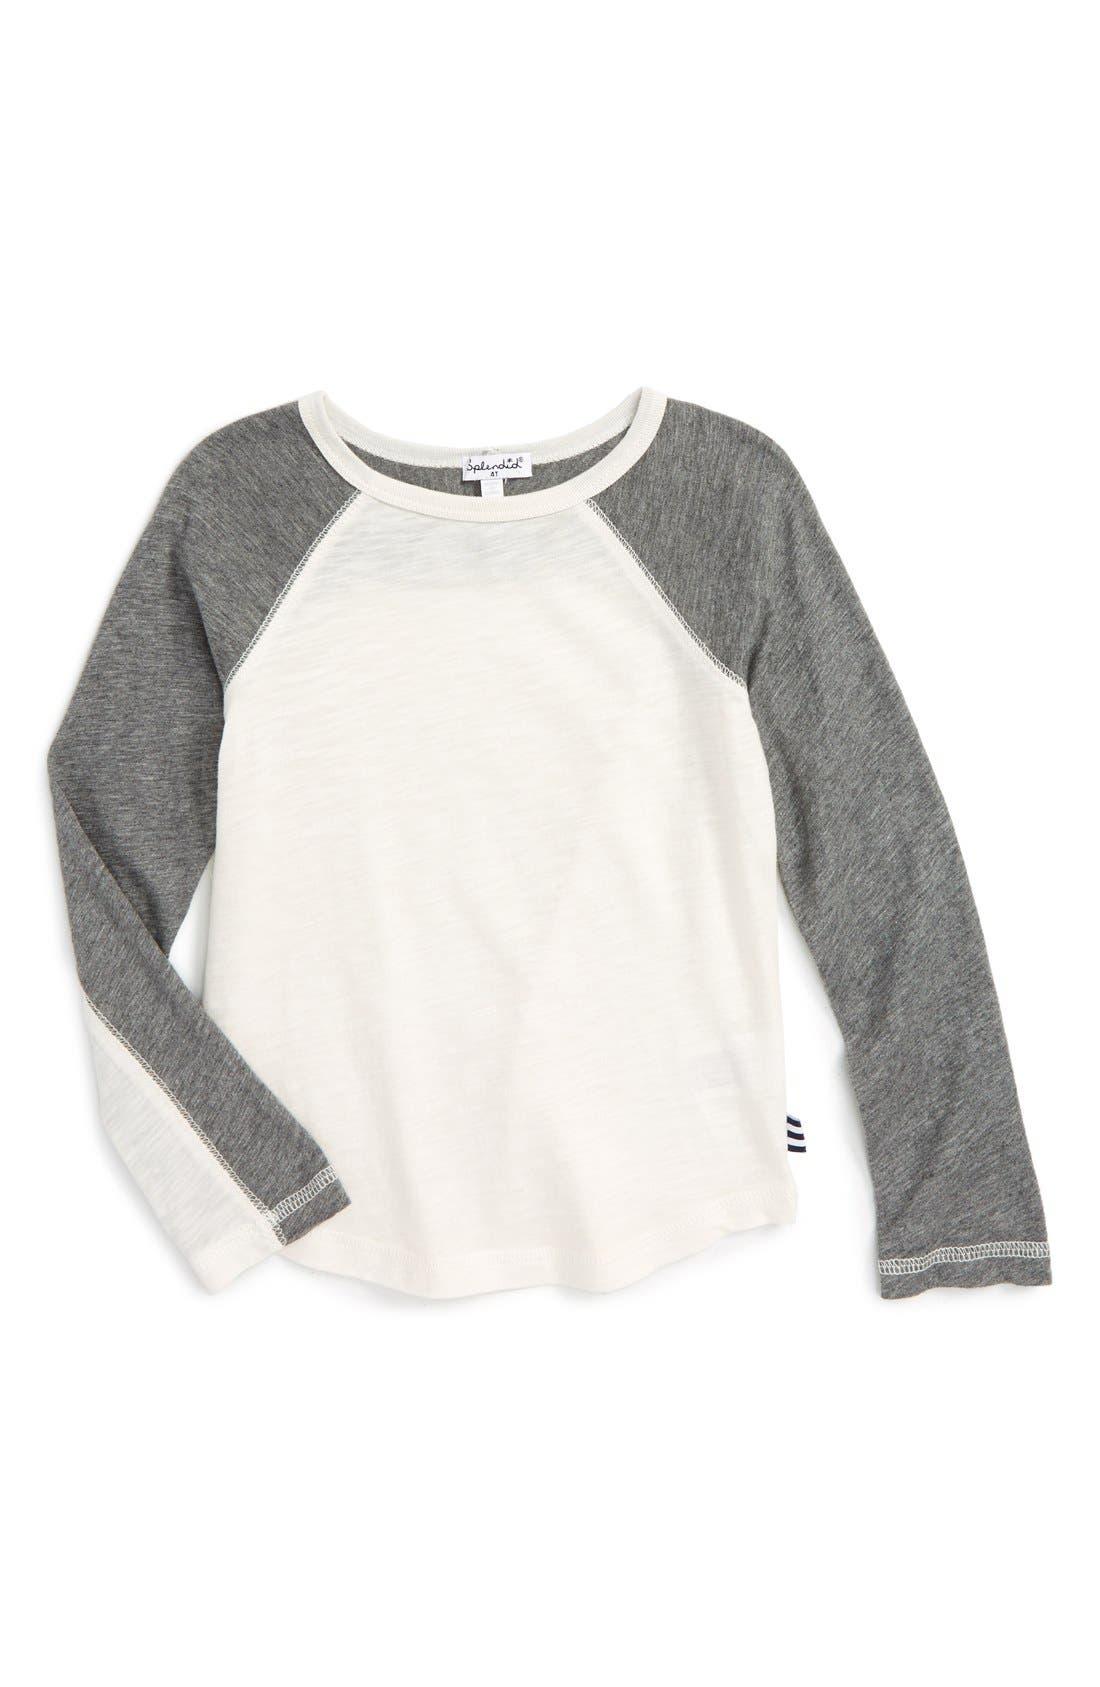 Splendid Slub Knit T-Shirt (Toddler Boys & Little Boys)